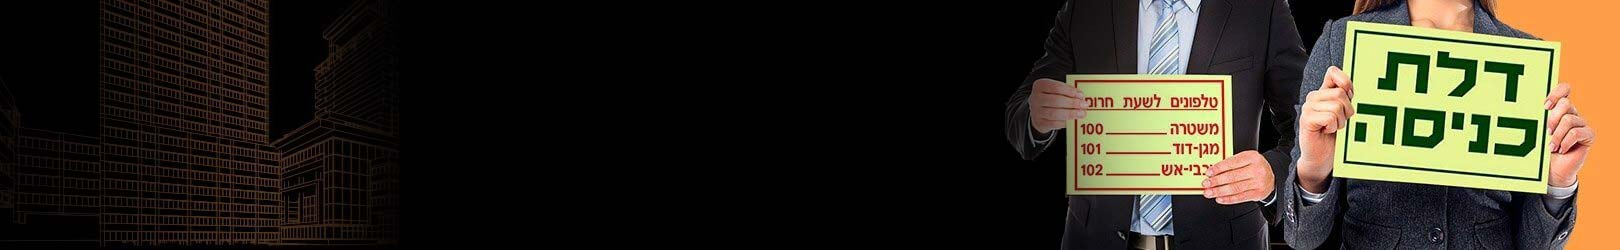 שילוט פולט אור